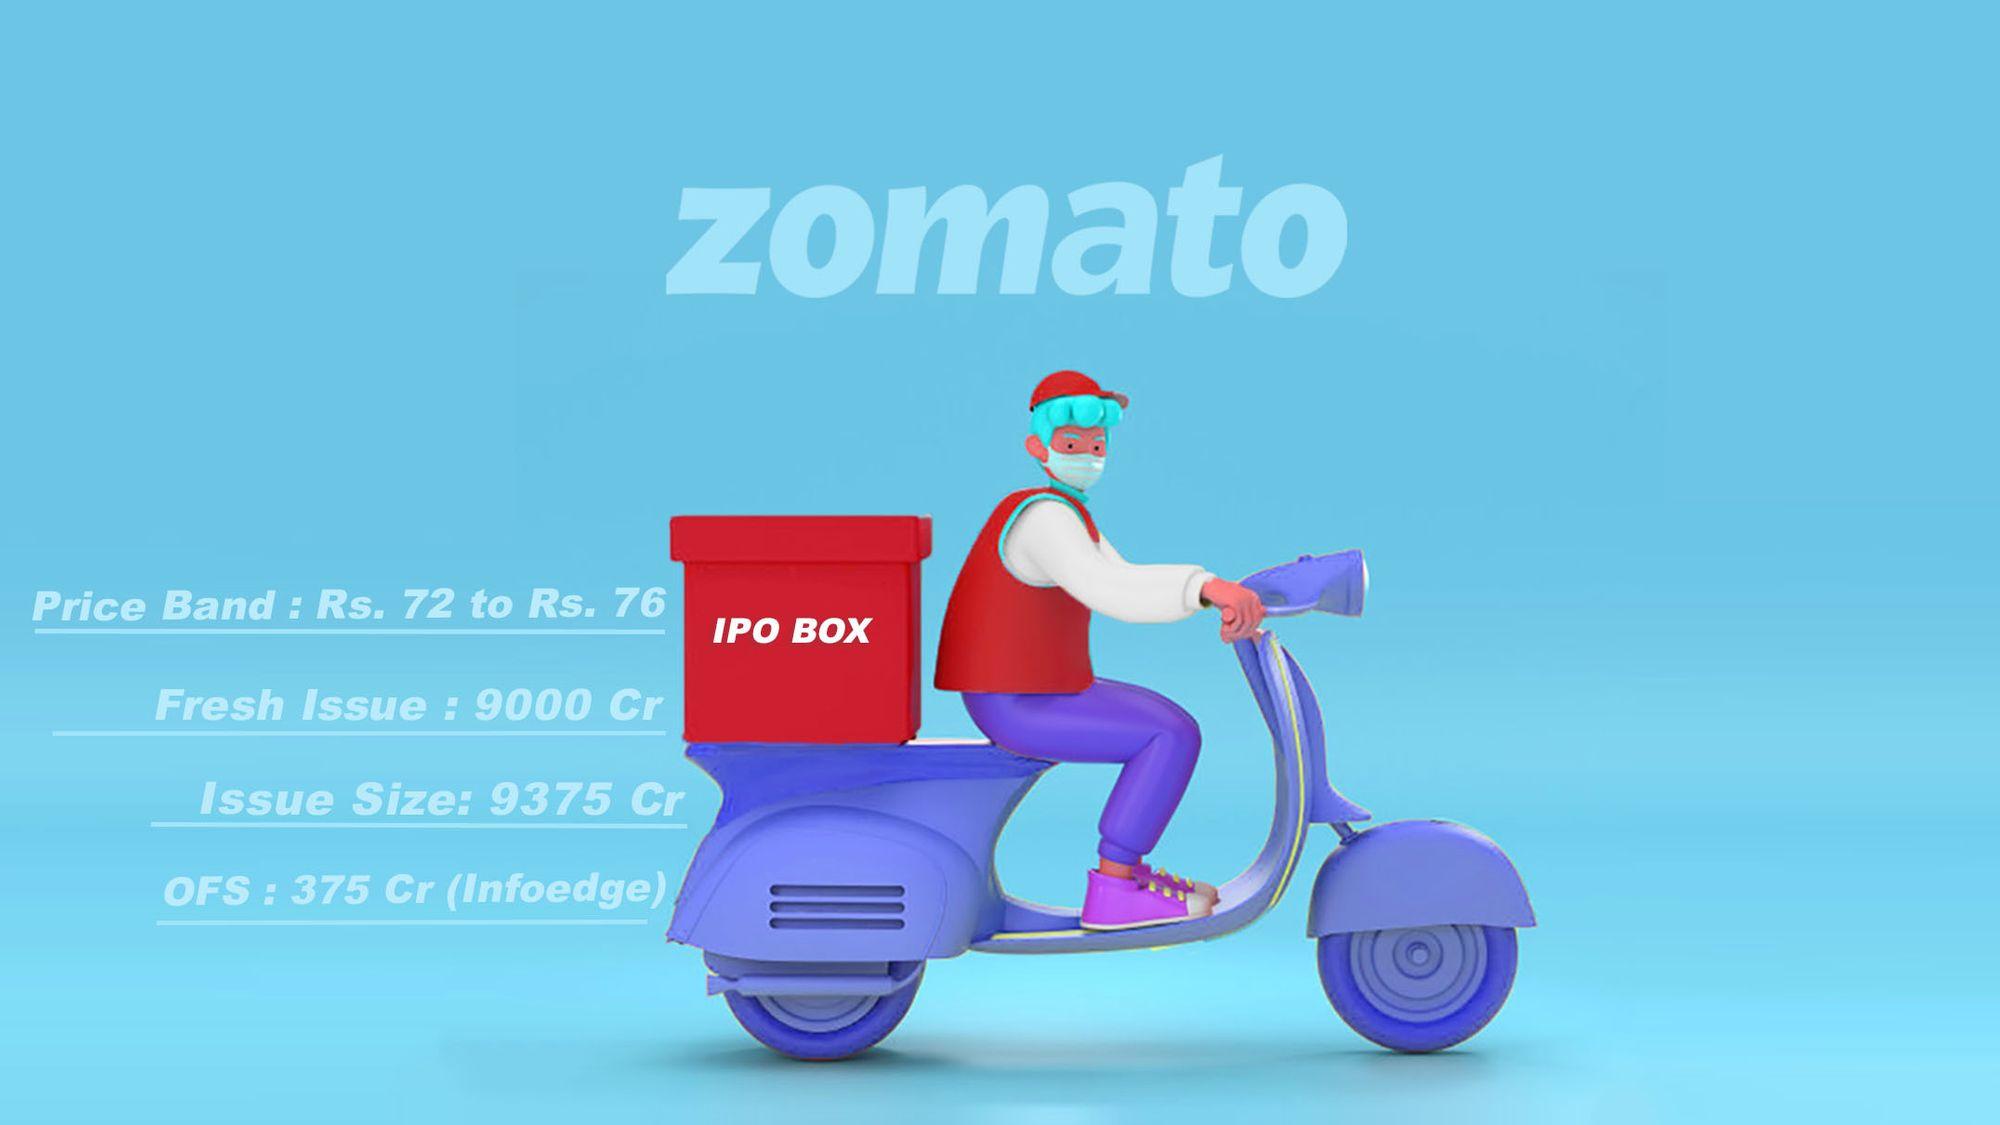 The Zomato IPO